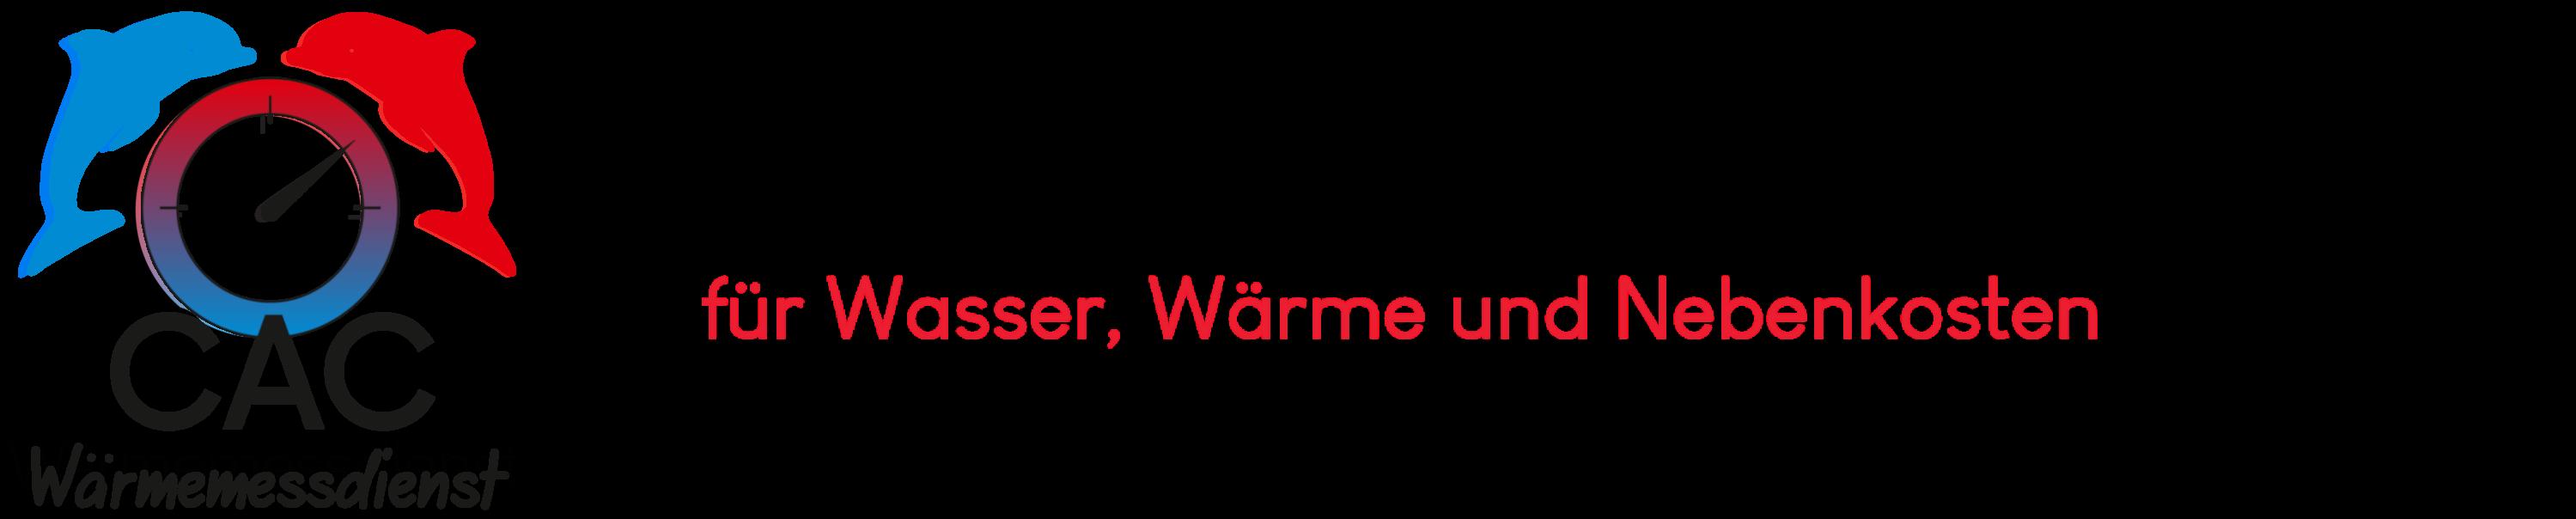 CAC Wärmemessdienst GmbH